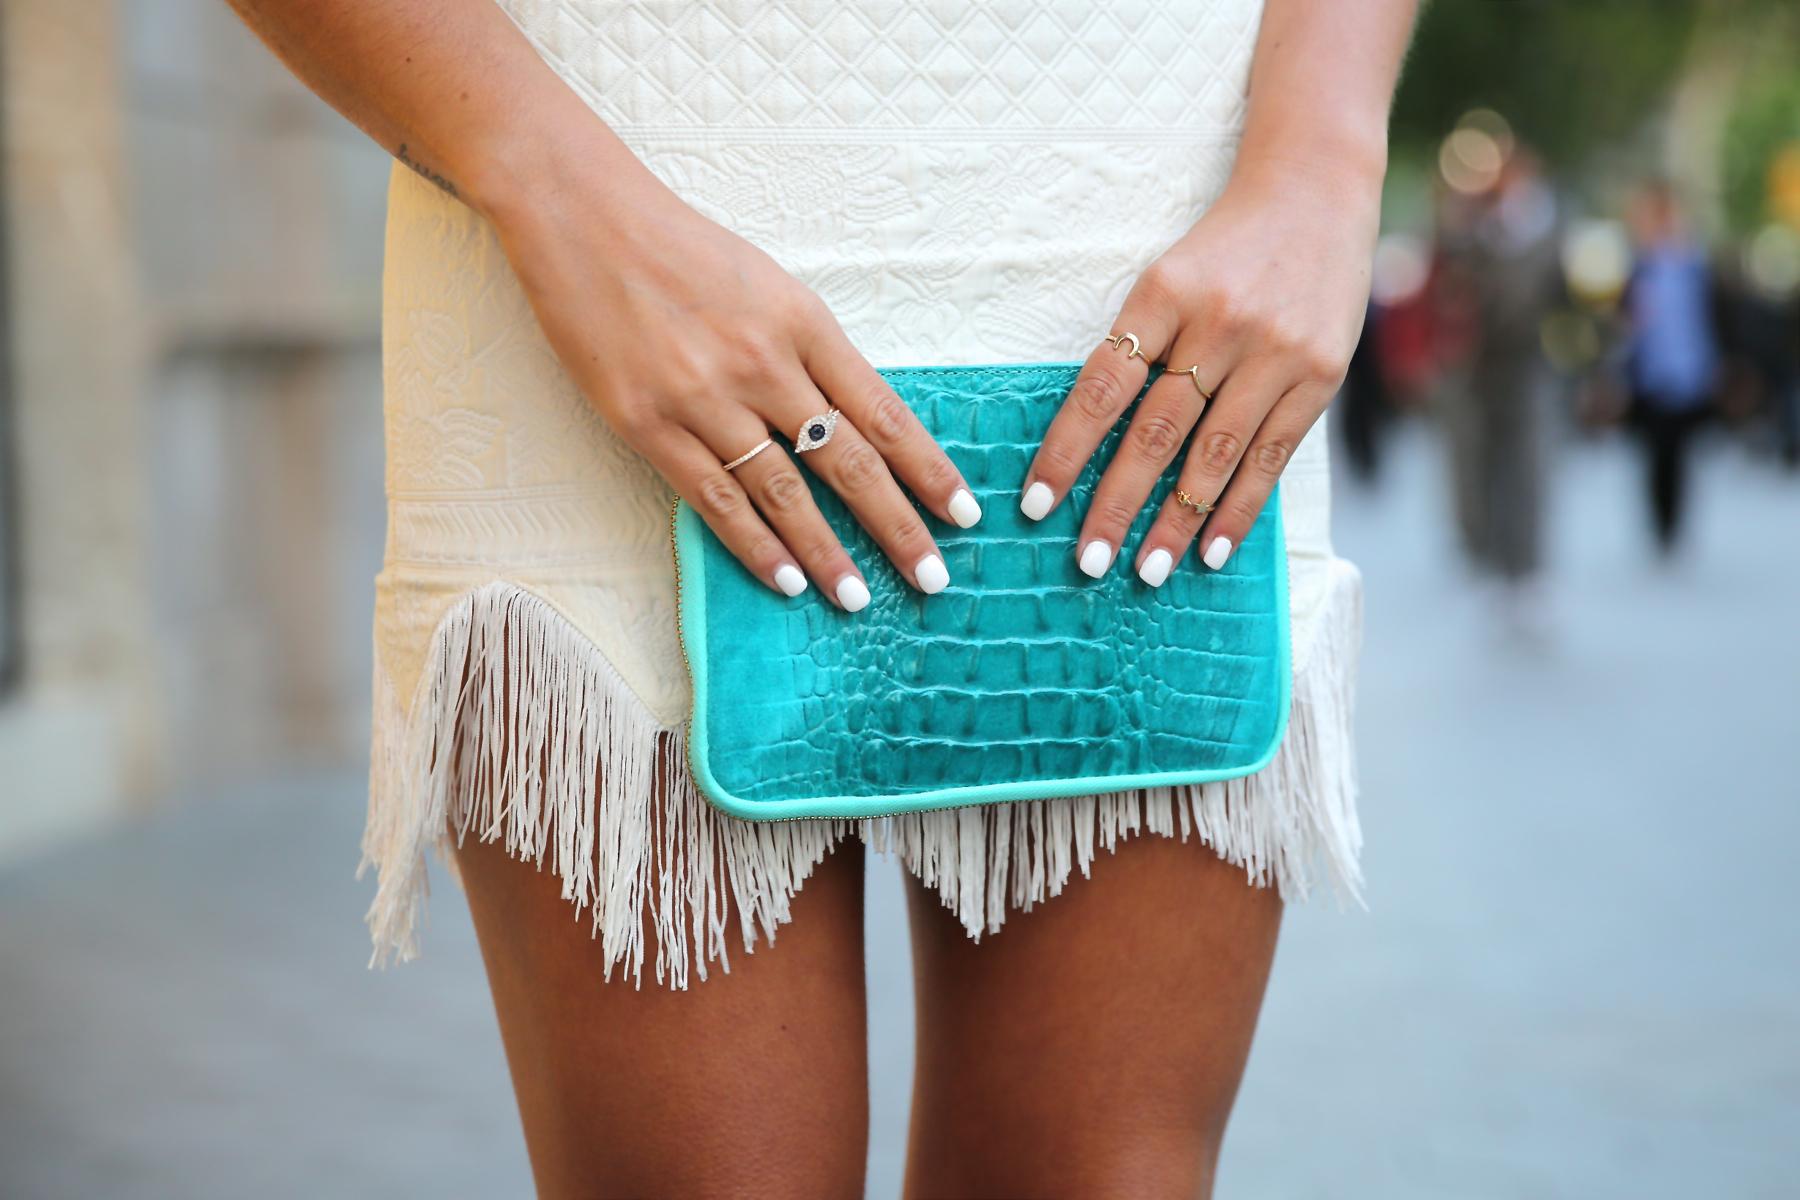 trendy_taste-look-outfit-hotel_majestic-street_style-ootd-blog-blogger-fashion_spain-moda_españa-falda_flecos-fringes_skirt-mas34-mango-blusa_flores-primaver_verano-zapatos_naranjas-tocado_dorado-2